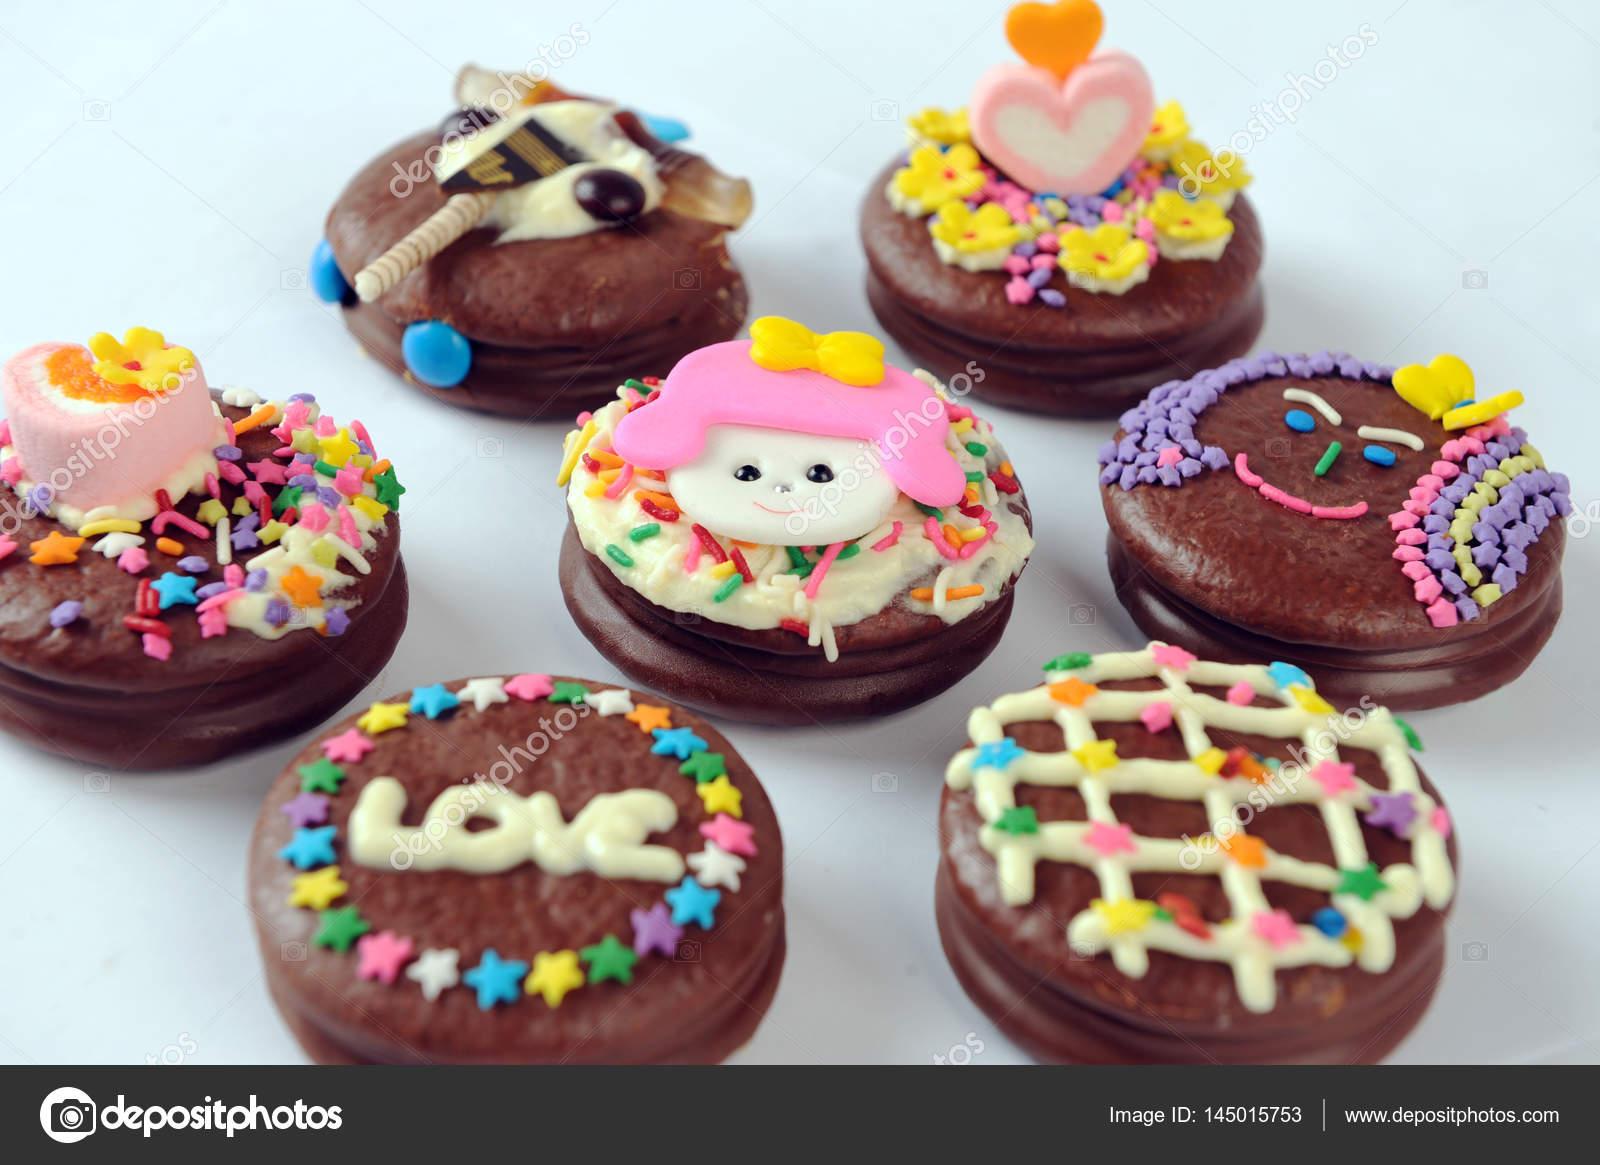 Imagenes Tortas Para Ninos Tortas De Chocolate Para Ninos Foto - Tortas-para-nios